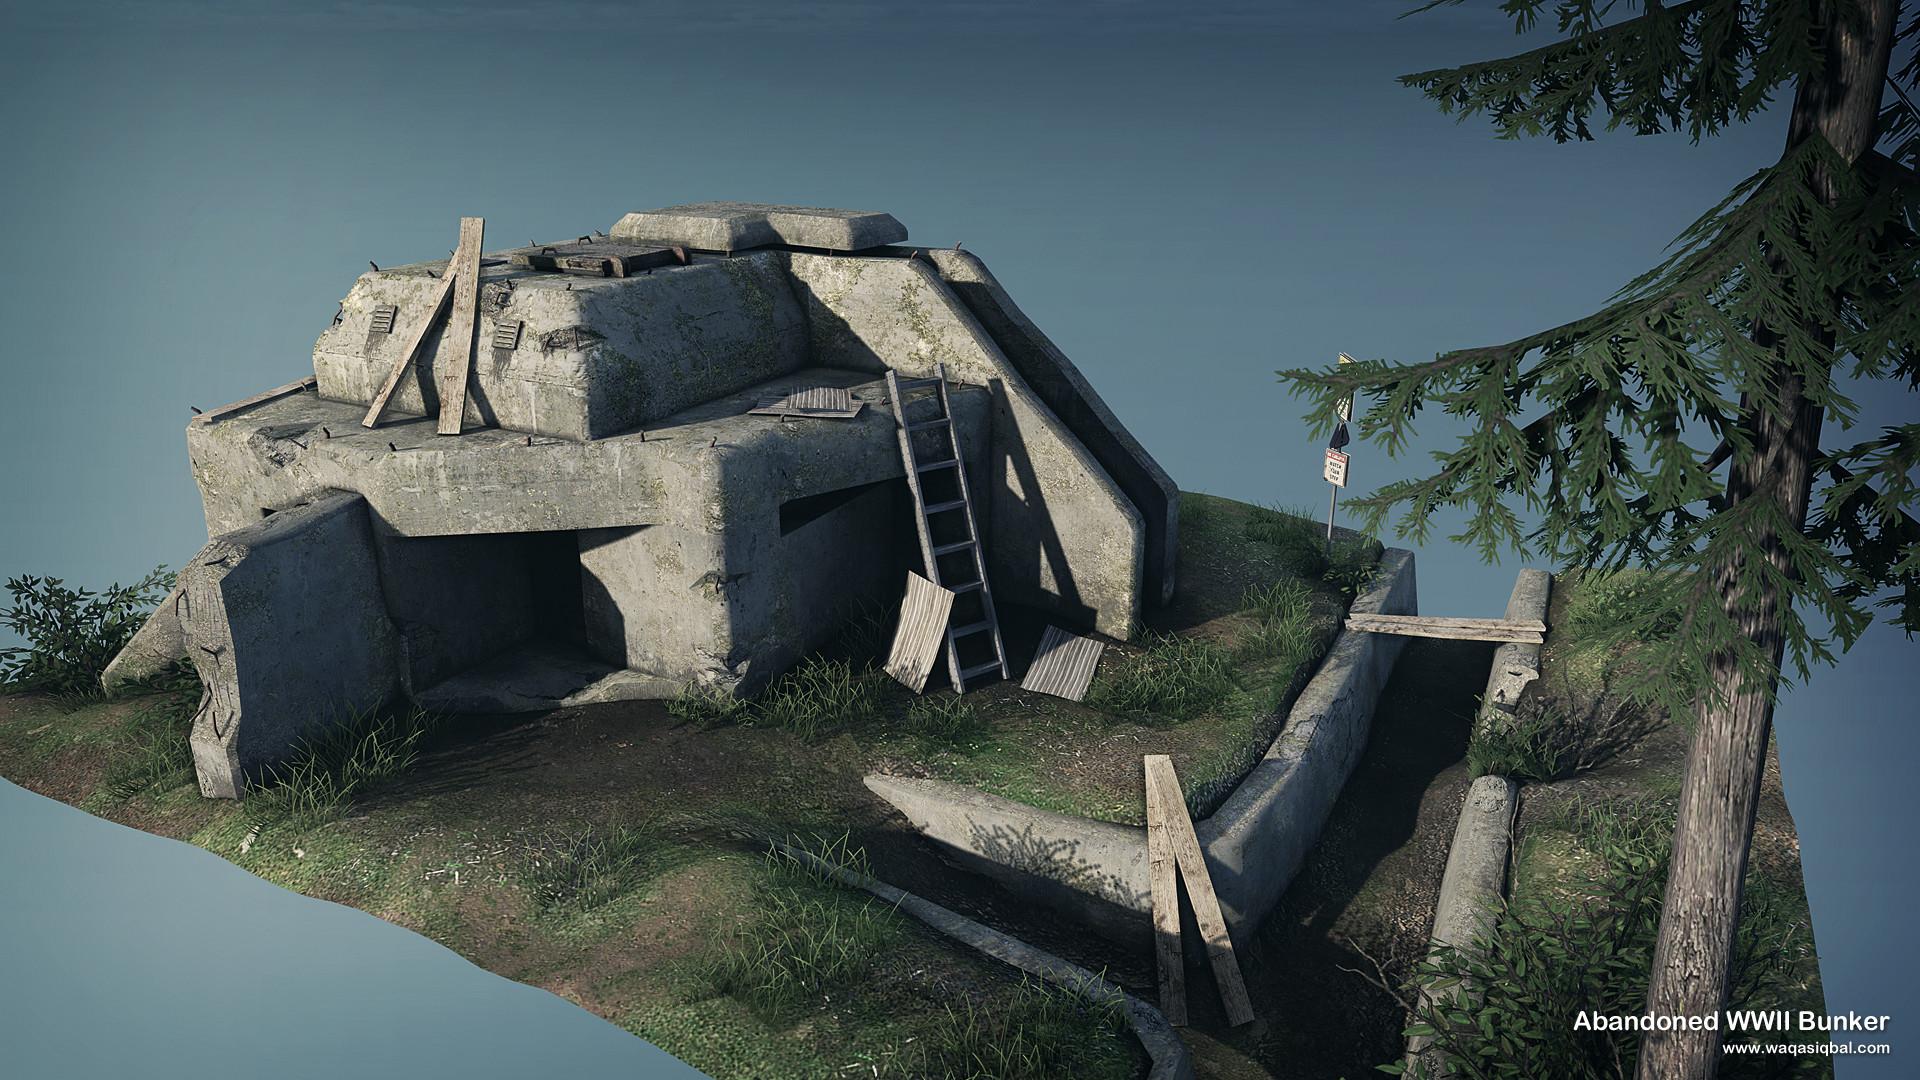 Waqas iqbal bunkerfinal 03